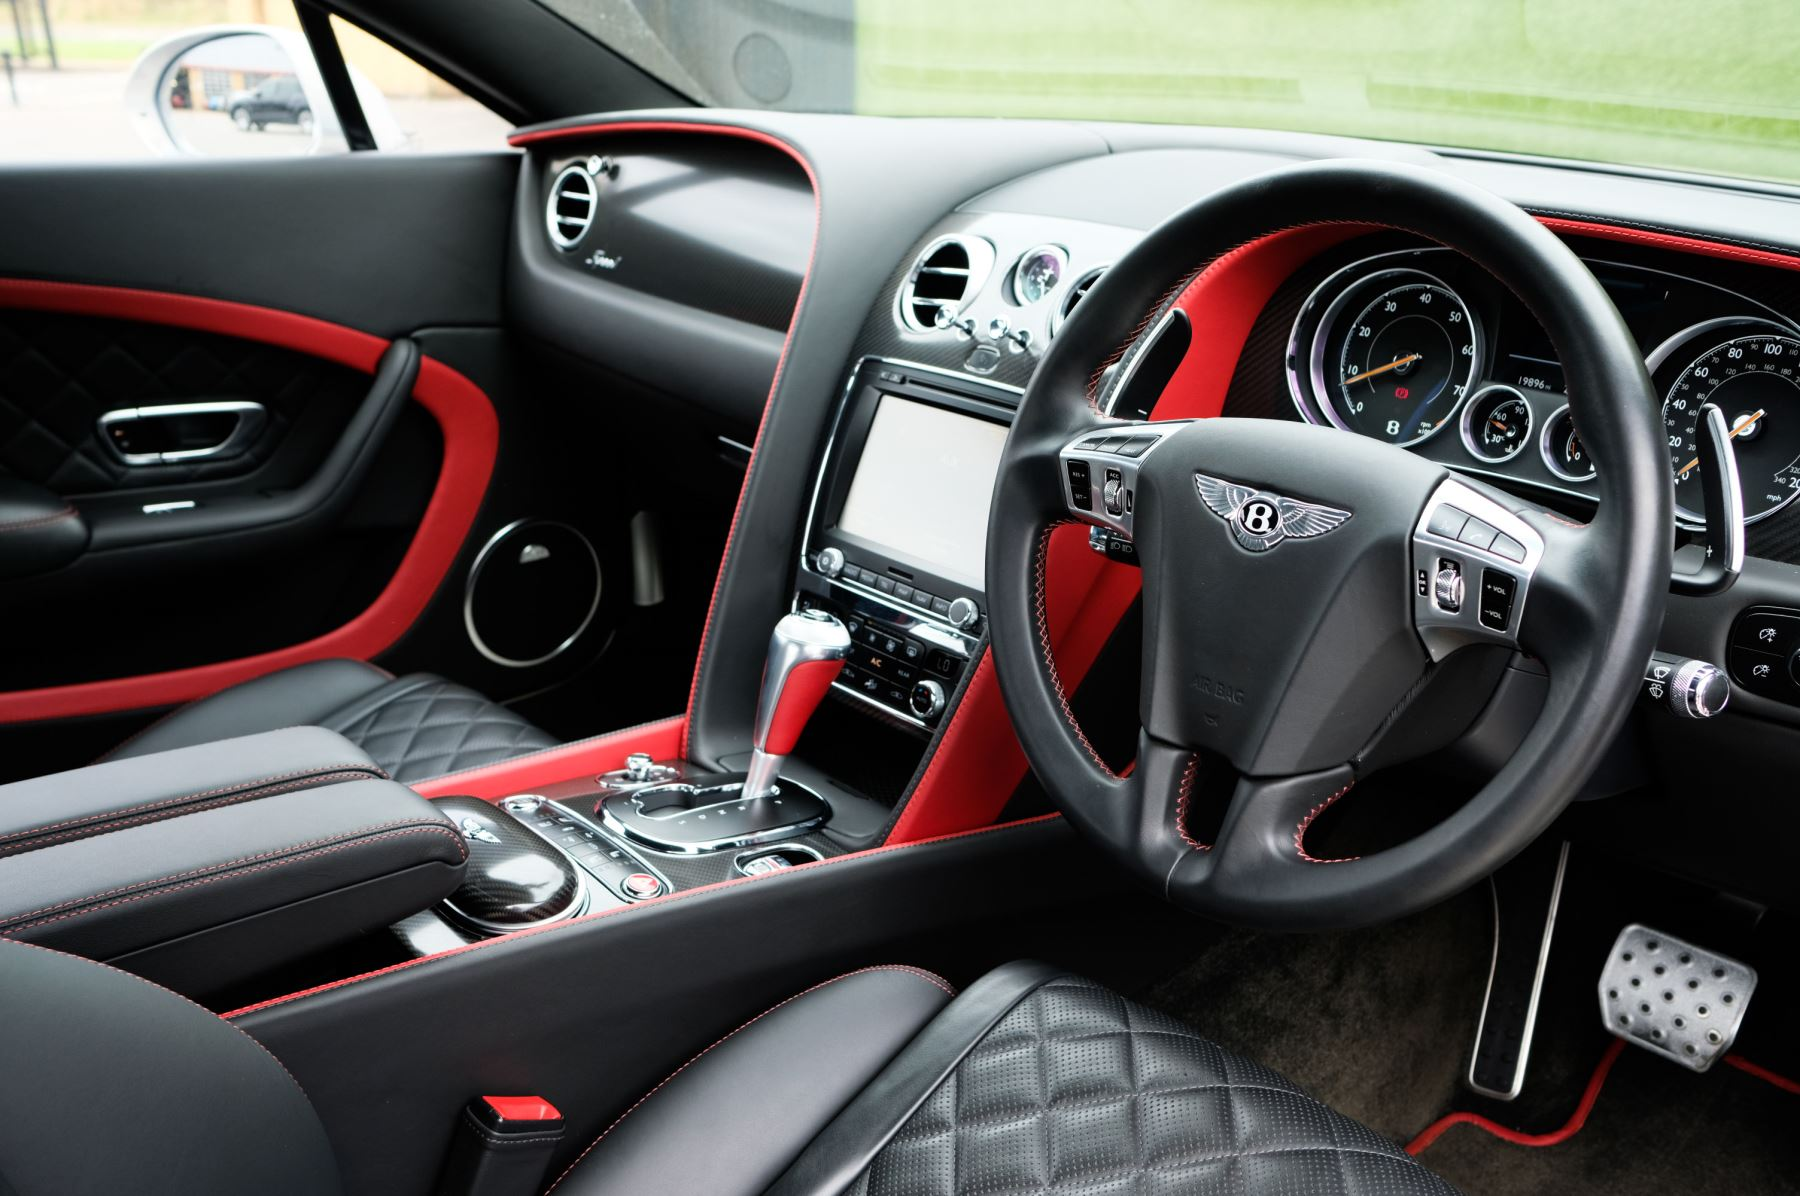 Bentley Continental GT 6.0 W12 [635] Speed - Premier Specification - Carbon Fibre Fascia Panels image 13